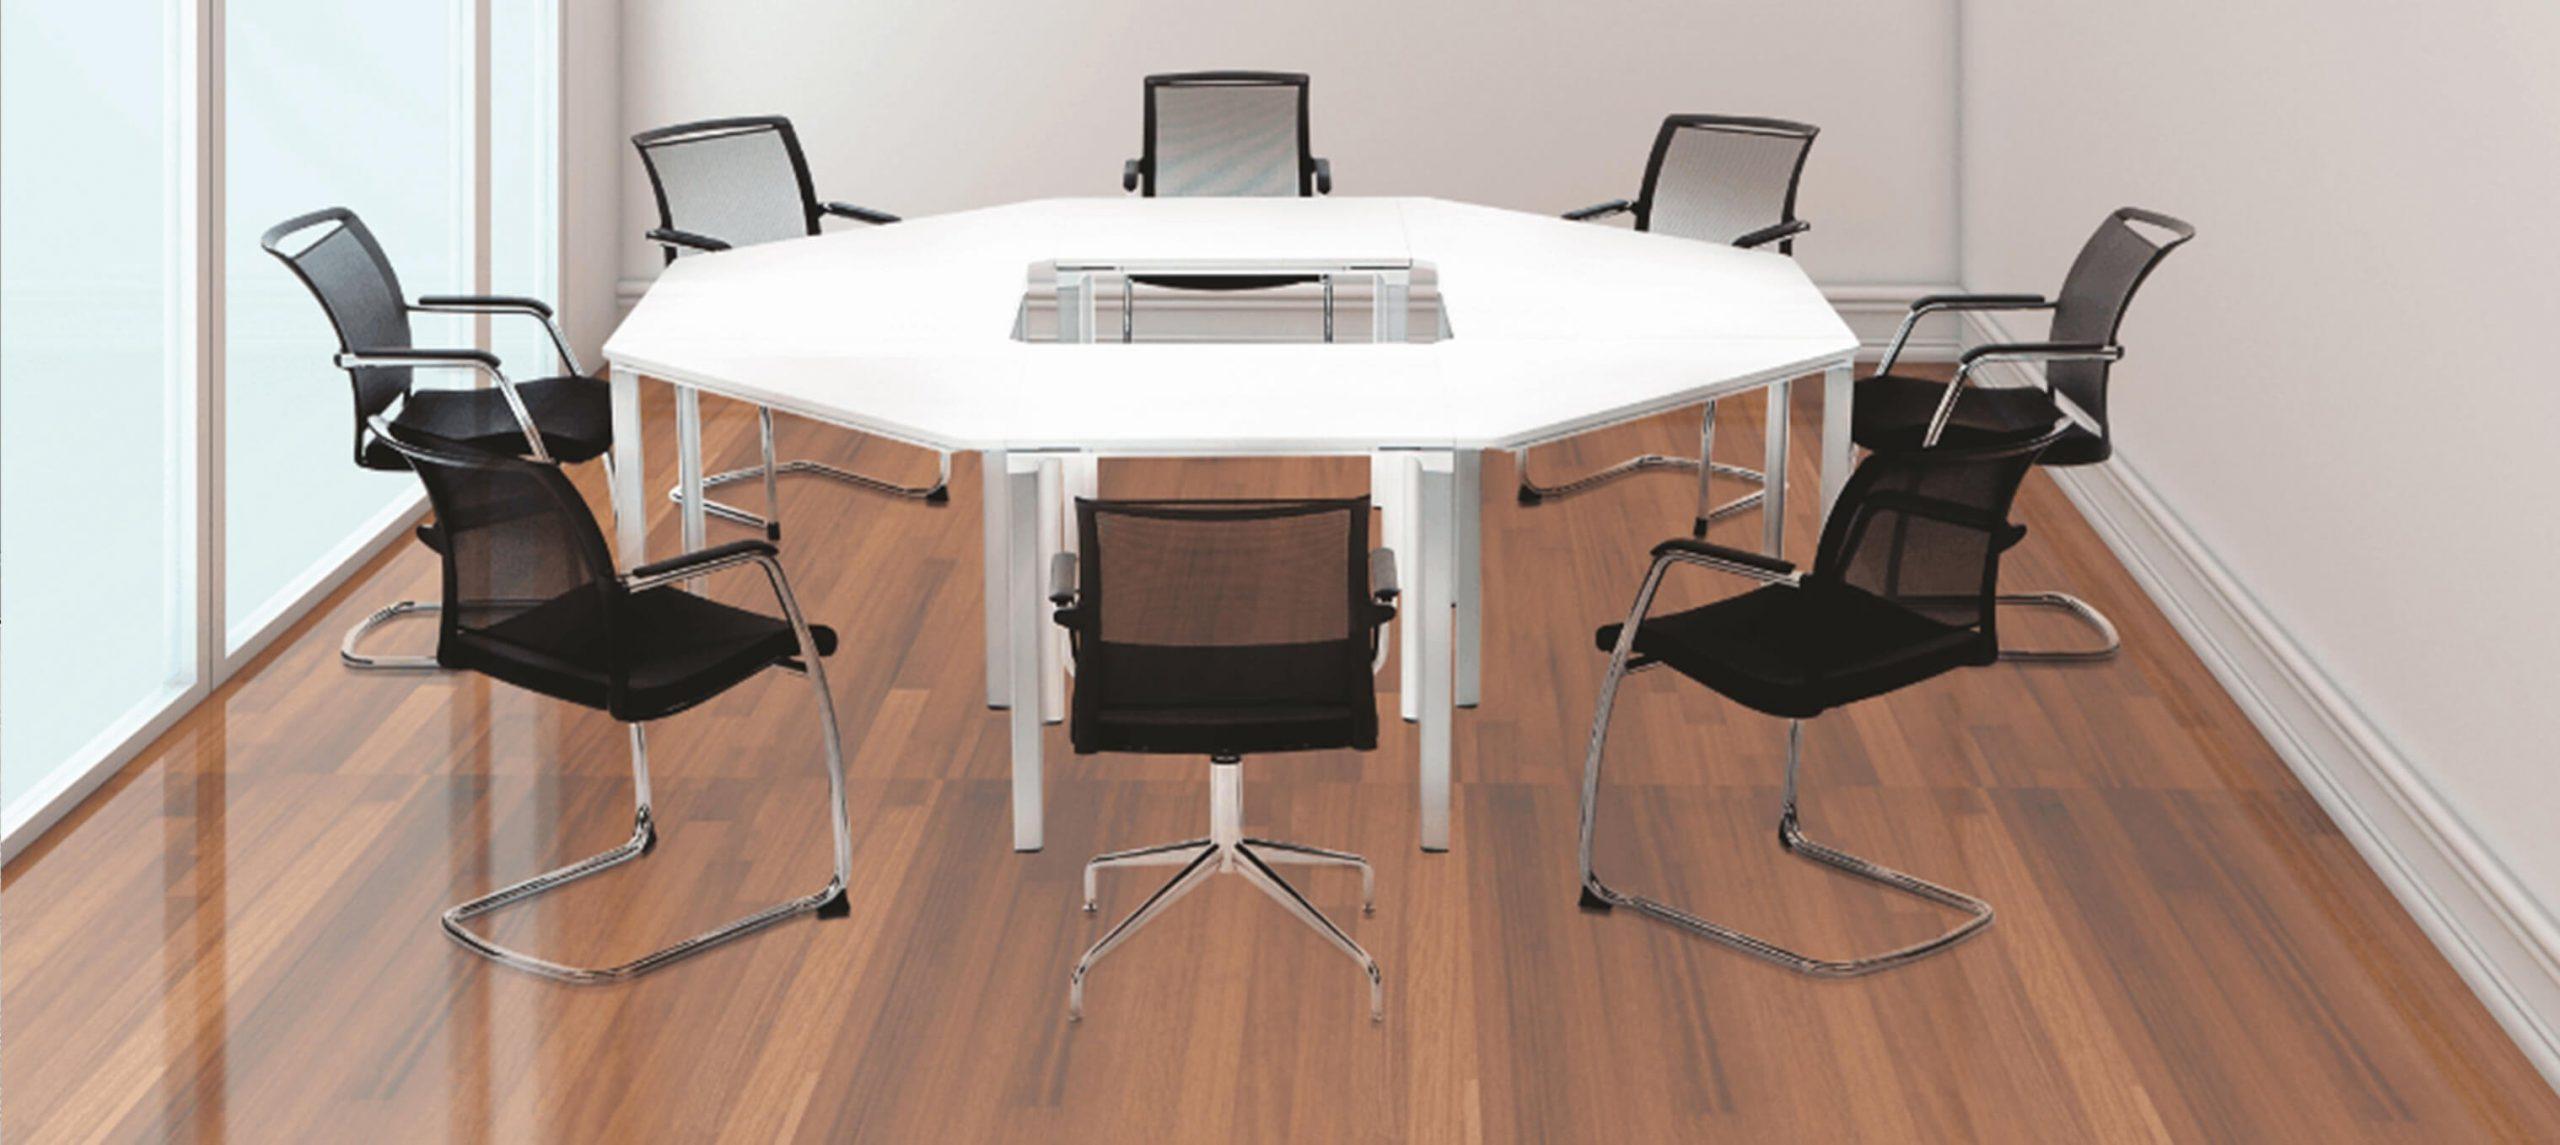 Forum Meeting Room Chairs  Hero